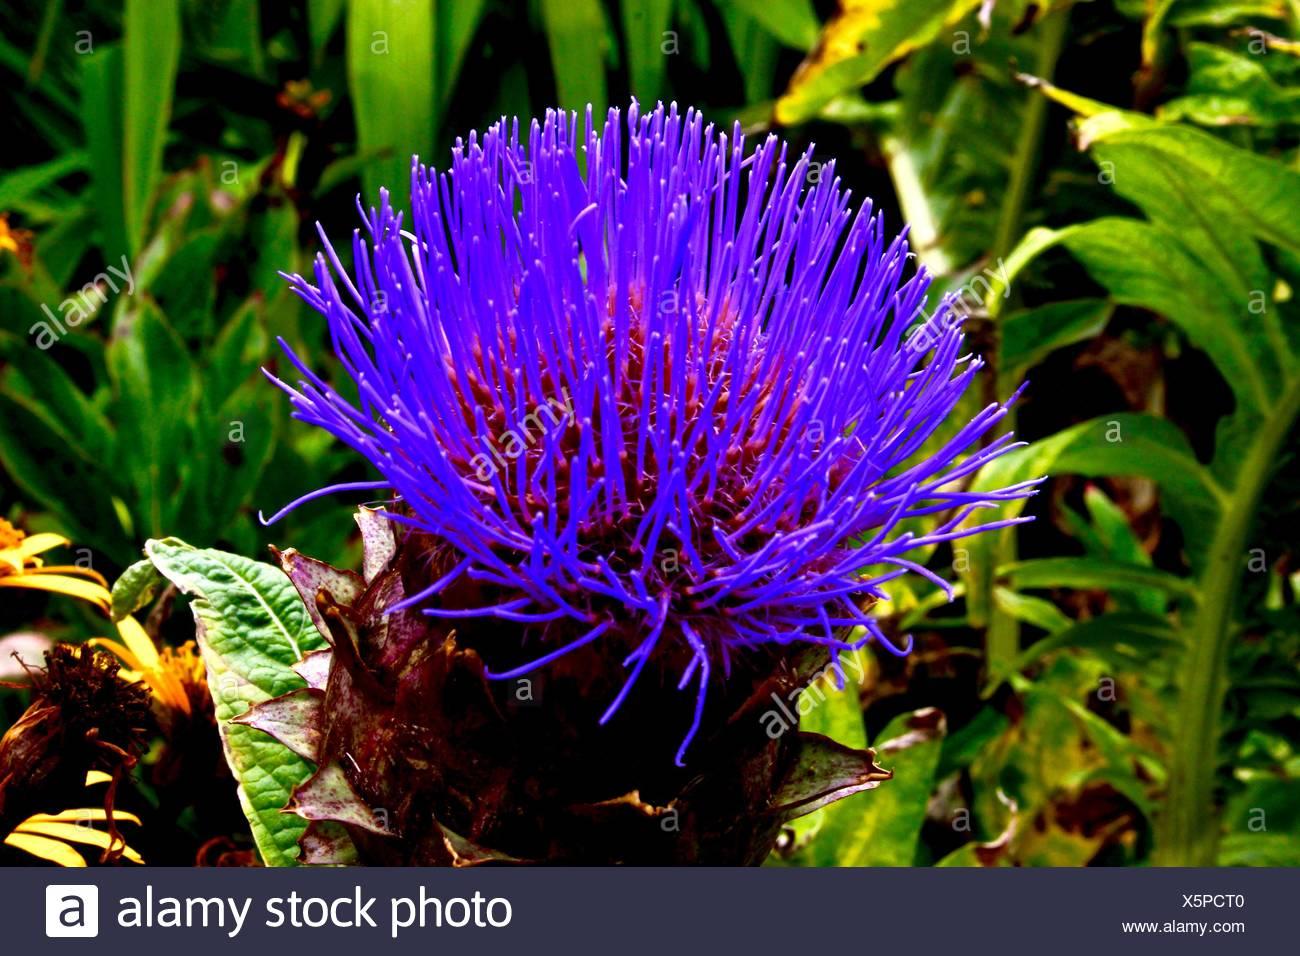 Purple Spiky Plant Stock Photos & Purple Spiky Plant Stock